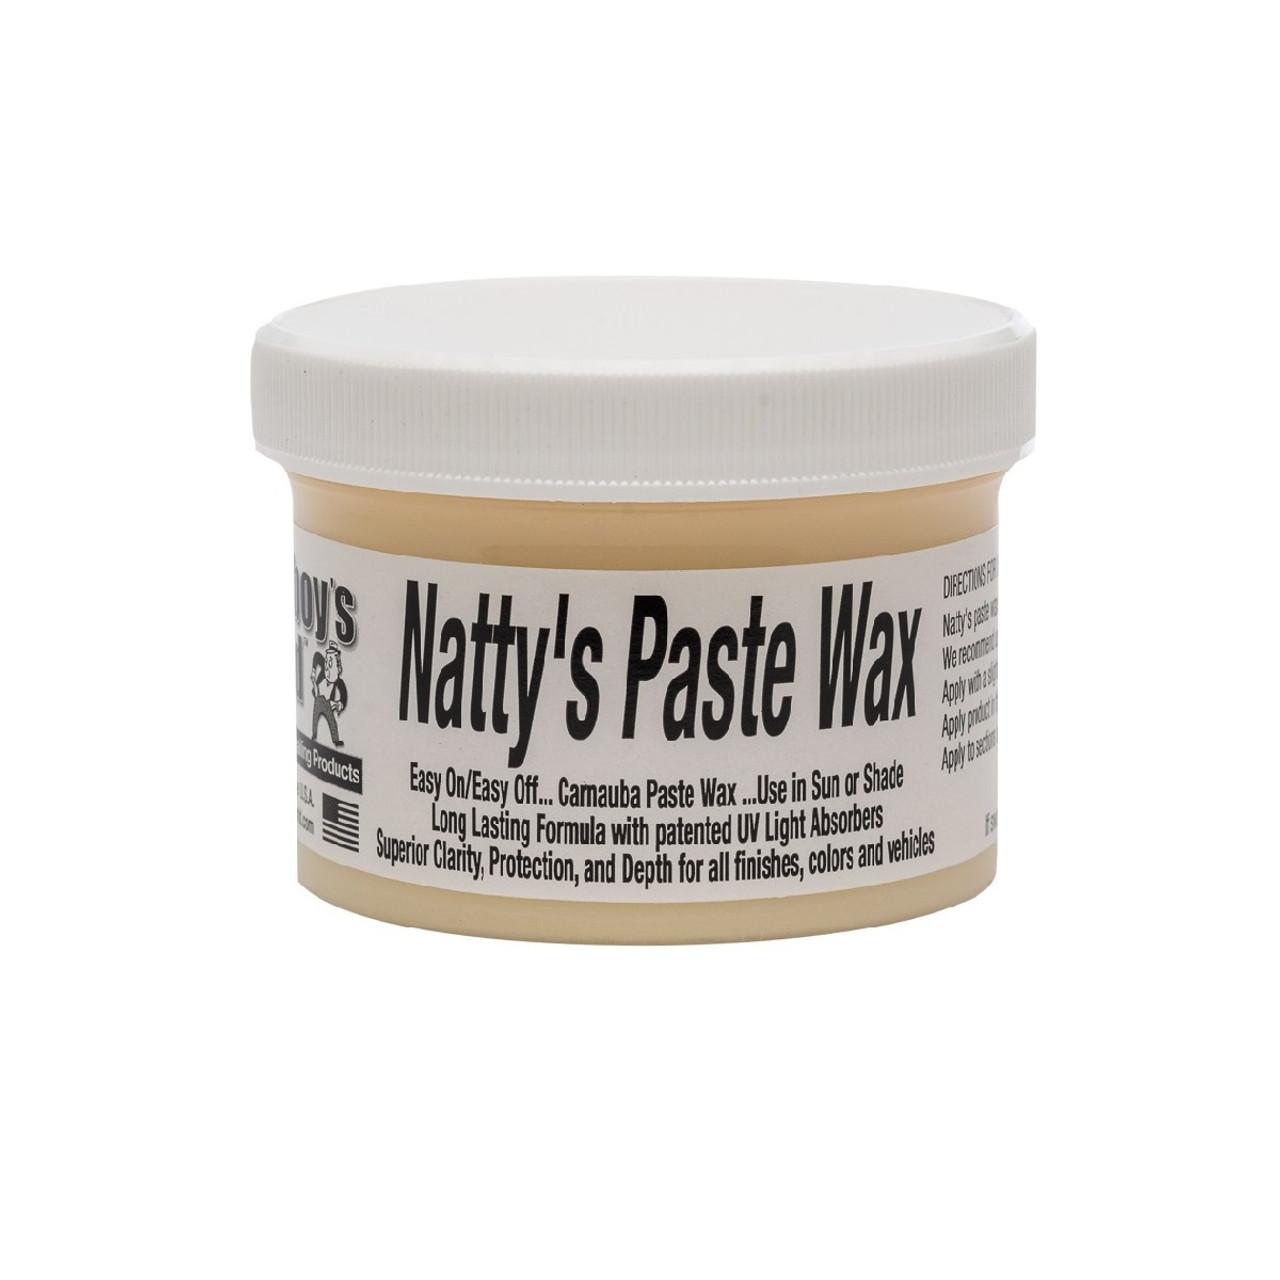 Poorboy's World Natty's Paste Wax 8oz